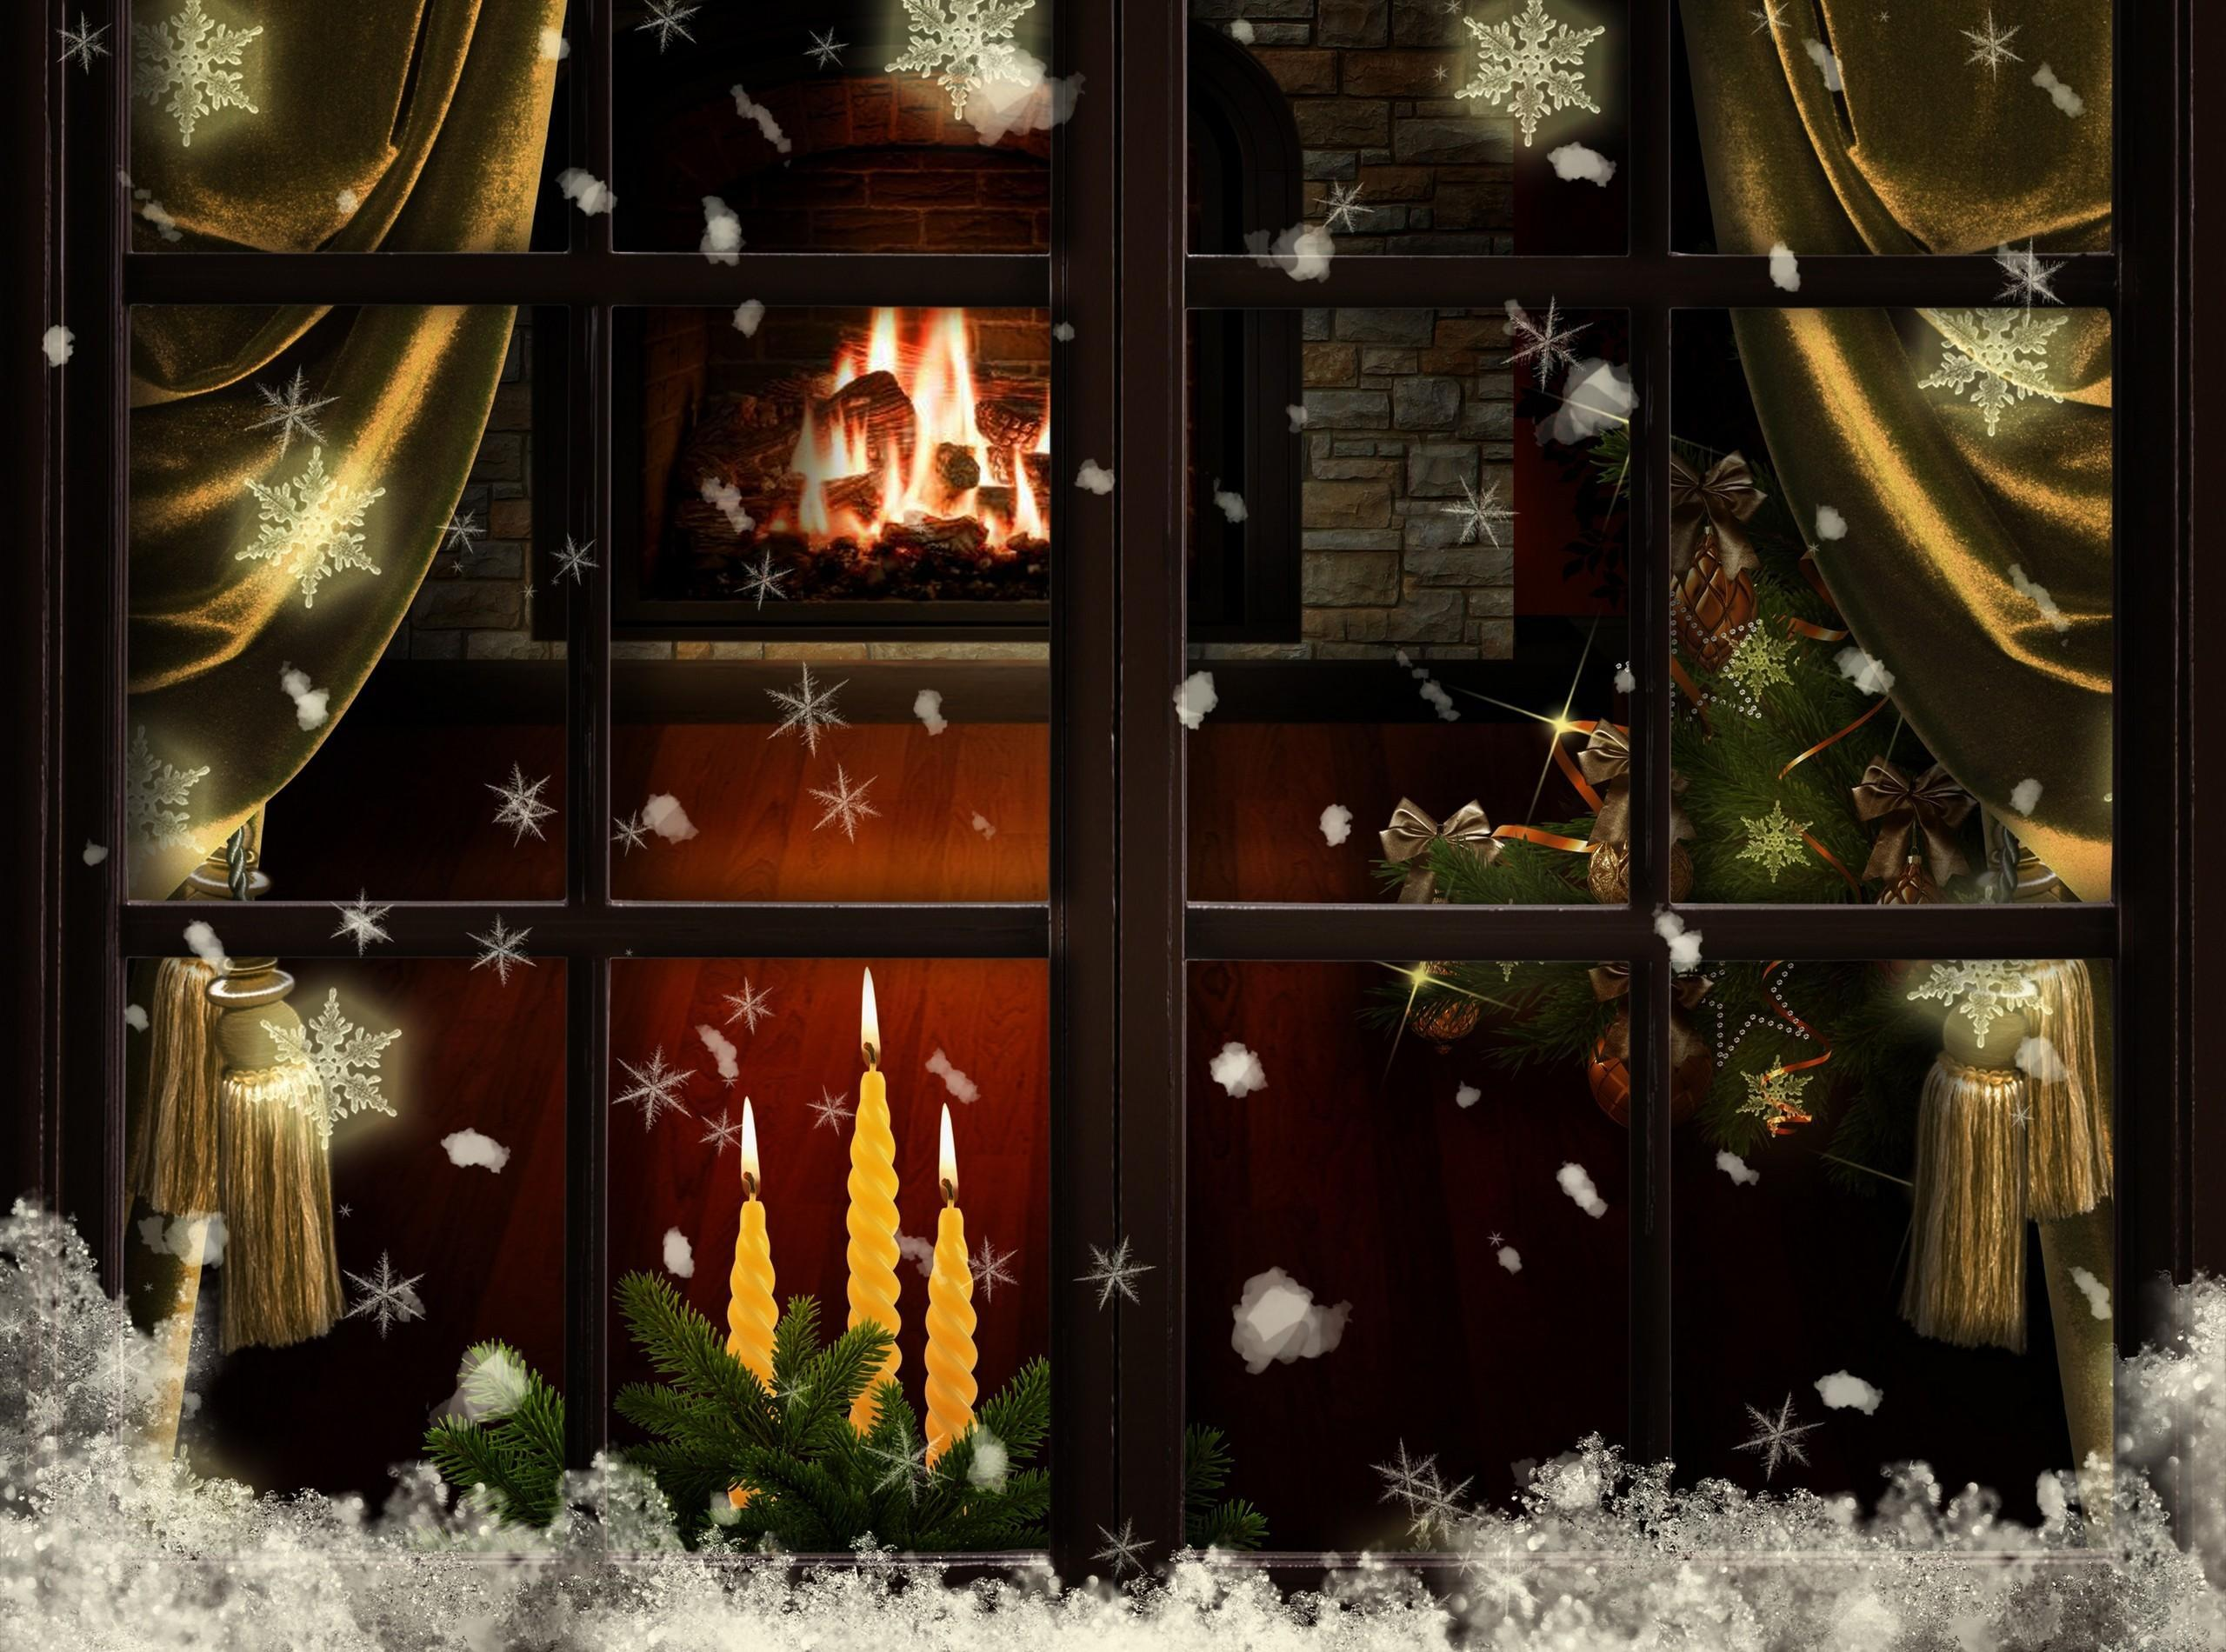 Window fireplace candles christmas tree cozy 2560x1900